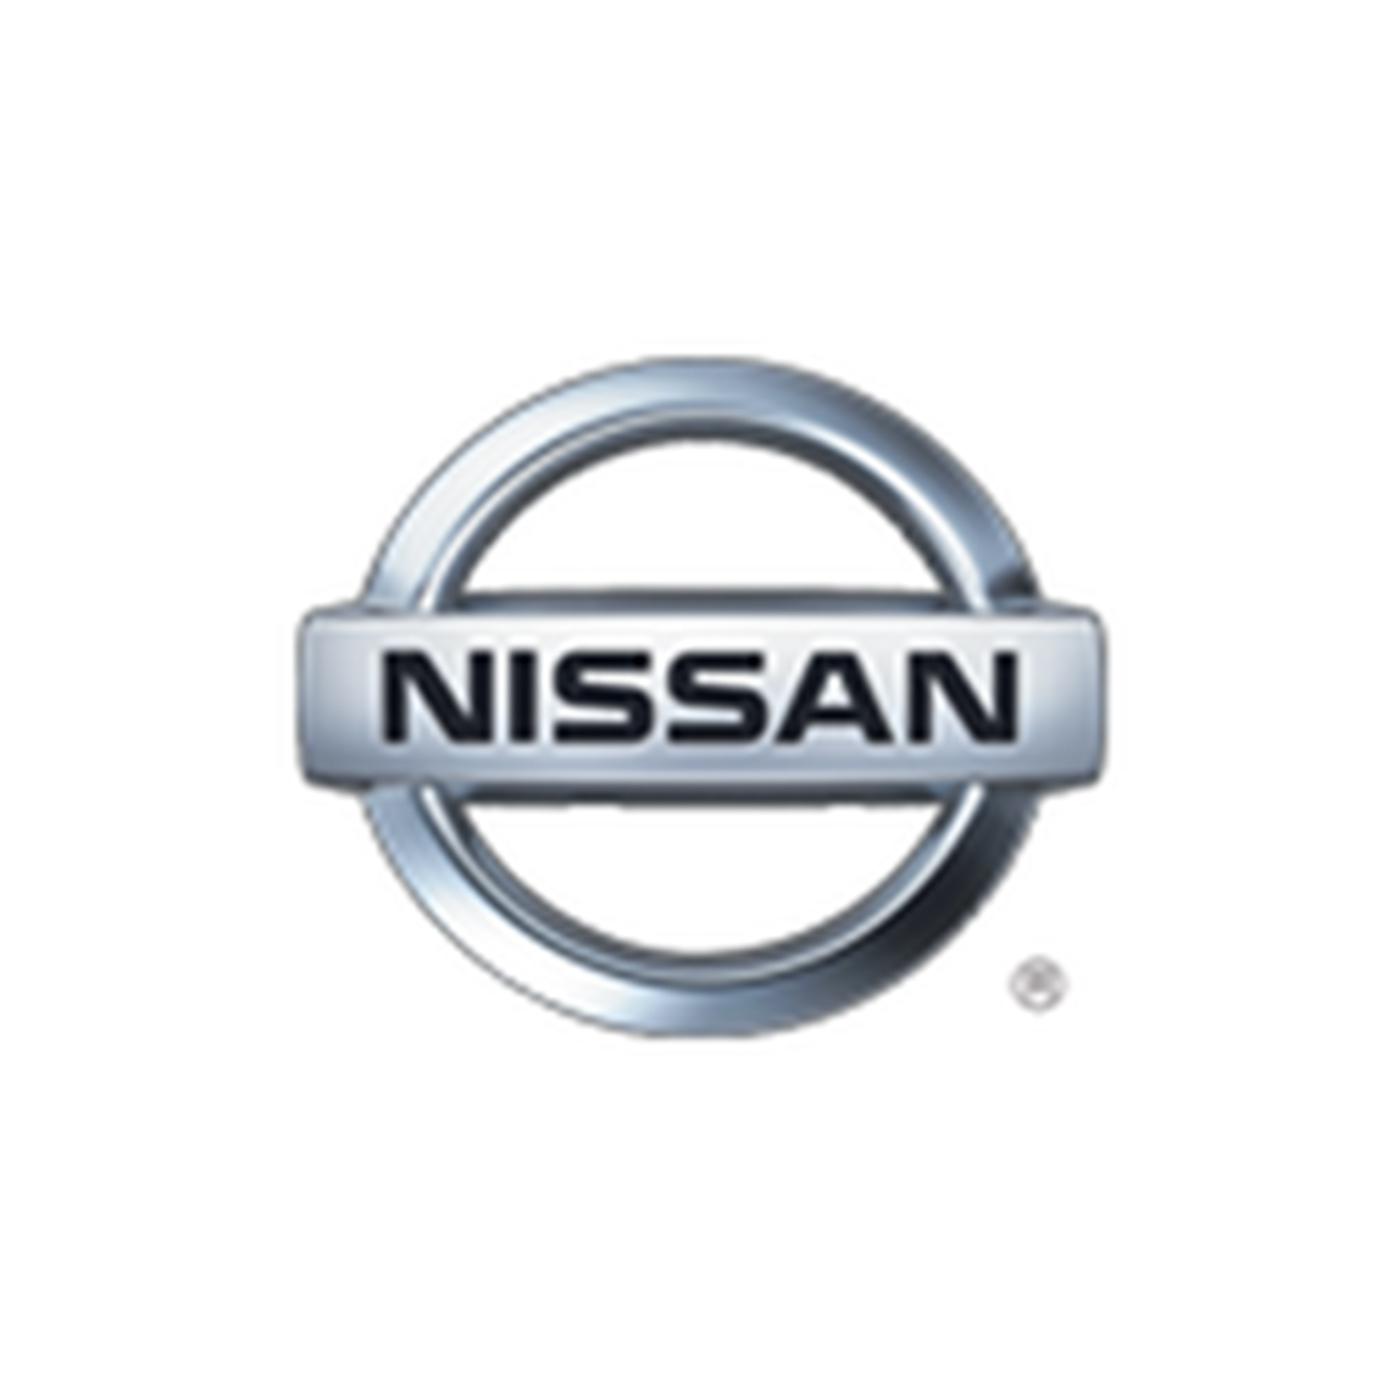 Ames Nissan